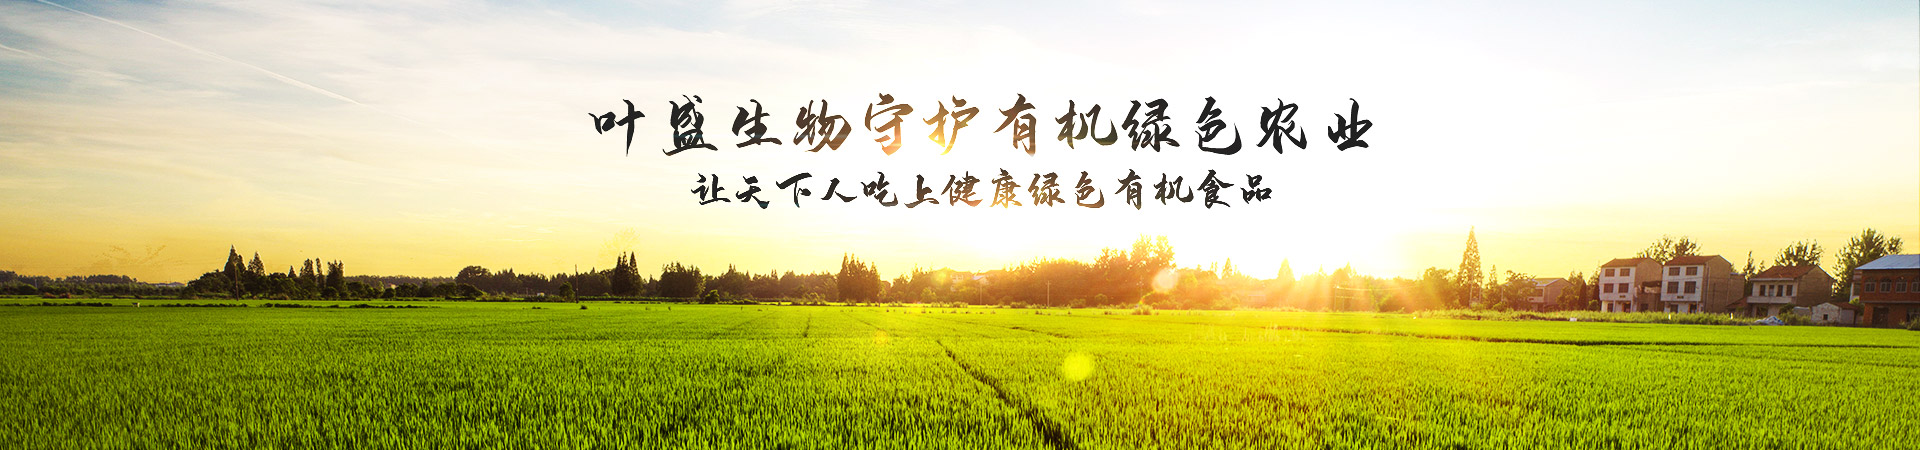 �剁�����╁���ゆ���虹豢�插��涓�